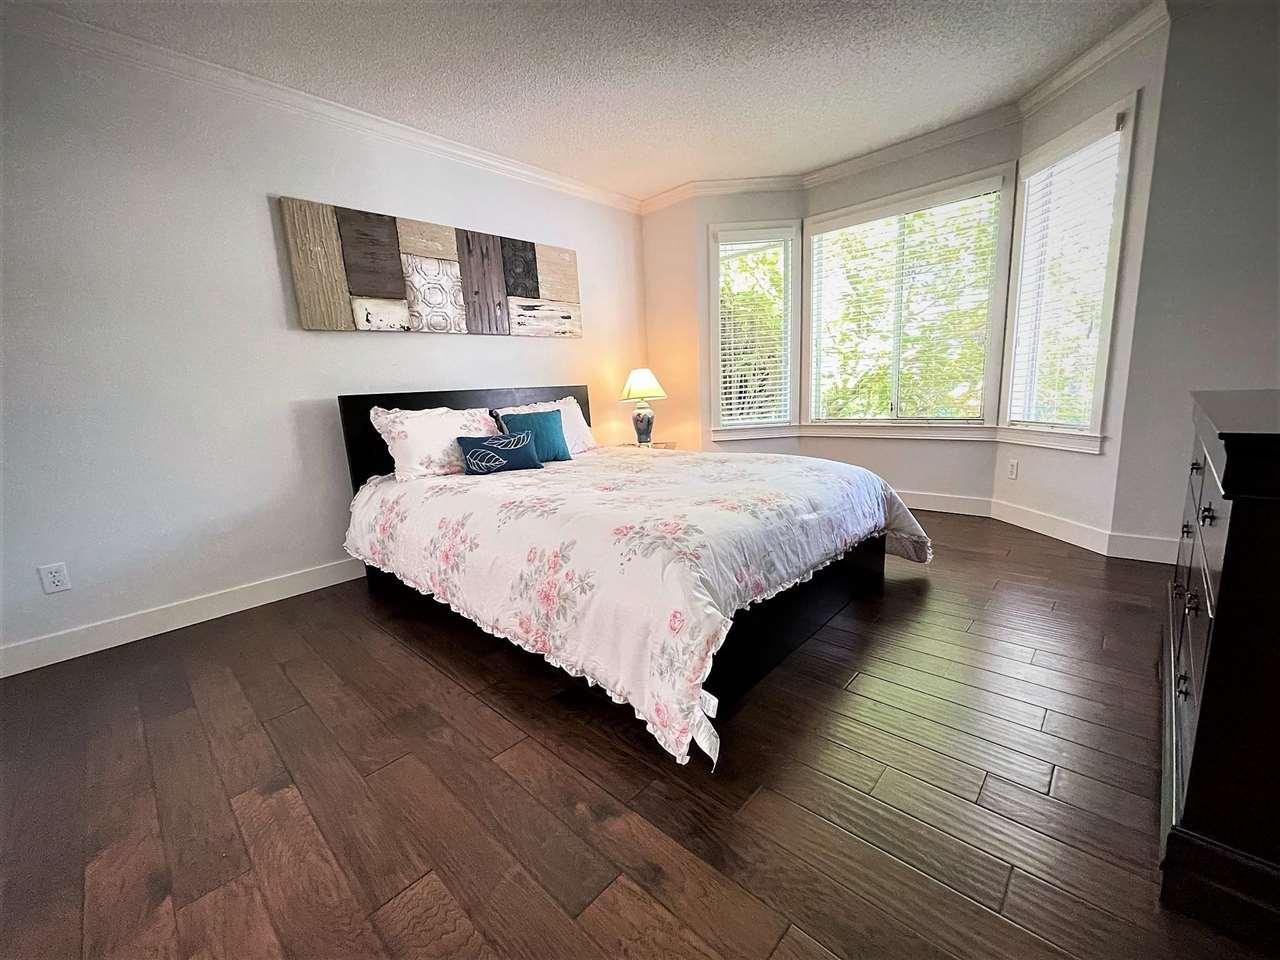 104 9045 WALNUT GROVE DRIVE - Walnut Grove Townhouse for sale, 3 Bedrooms (R2588351) #17